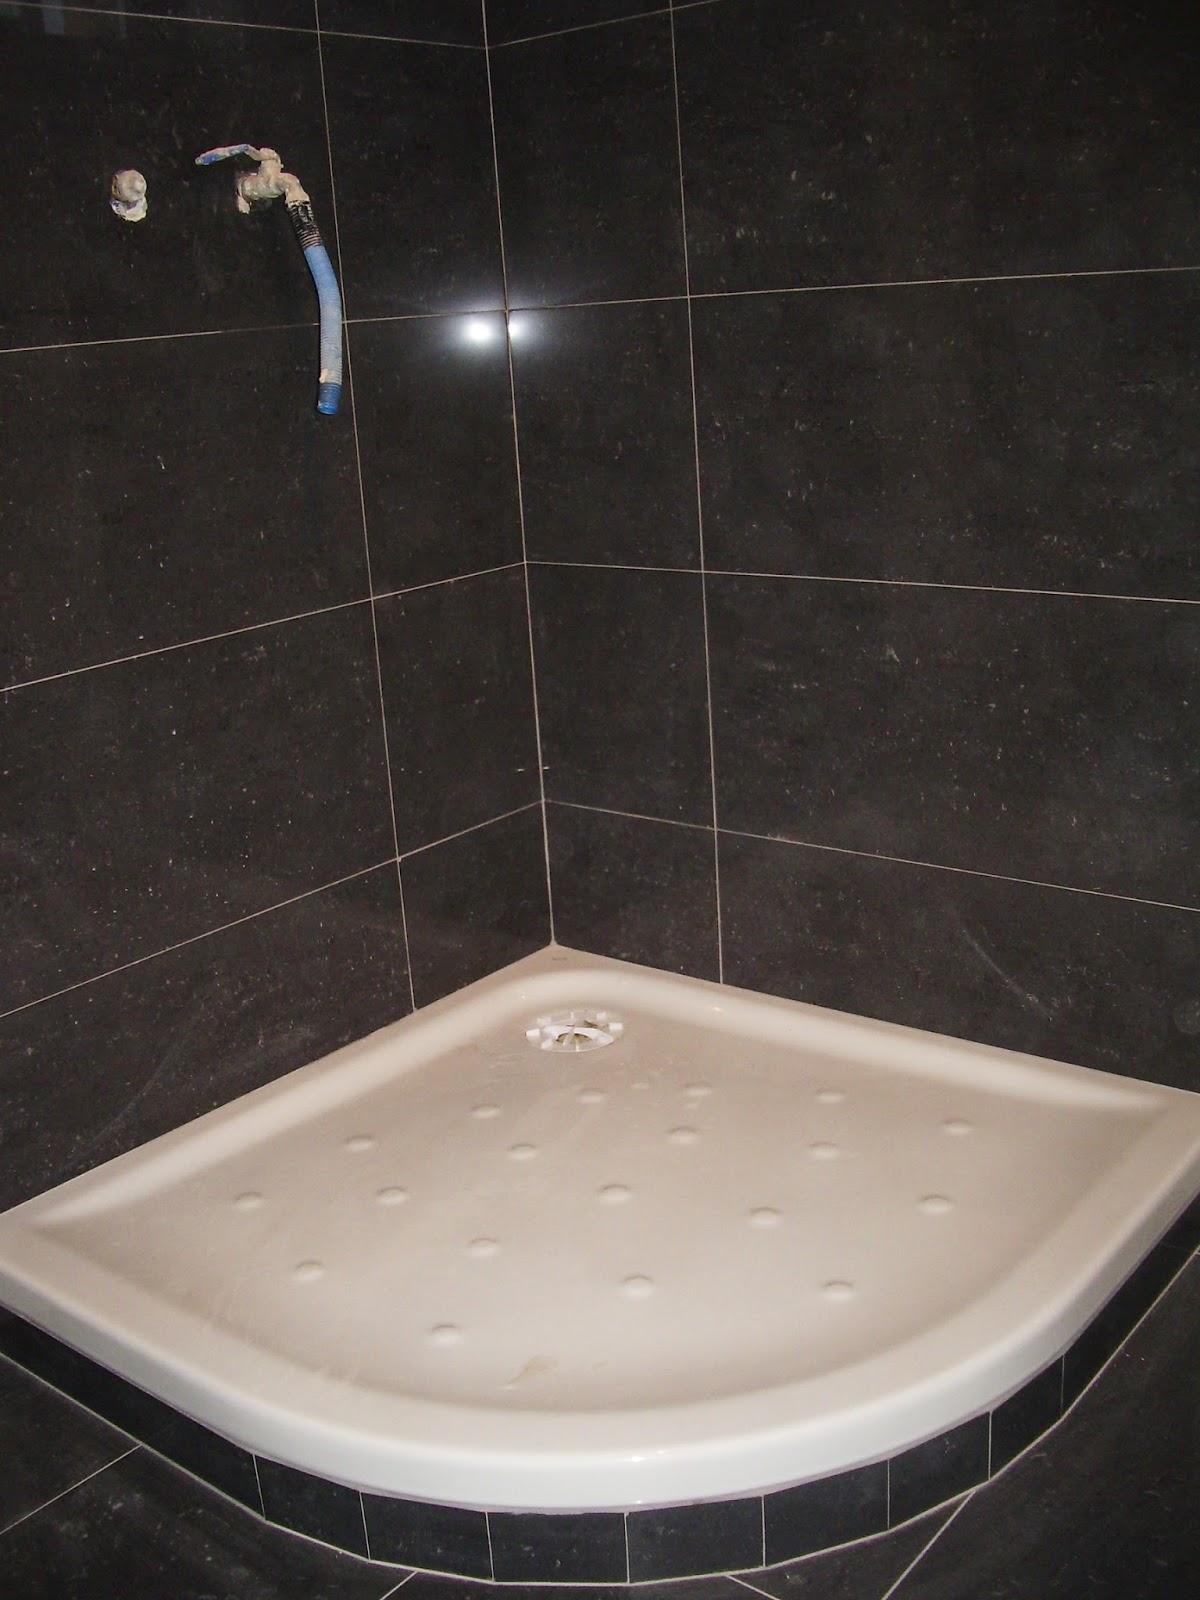 Baldosassa fotos e imagenes de platos de ducha for Plato de ducha malta